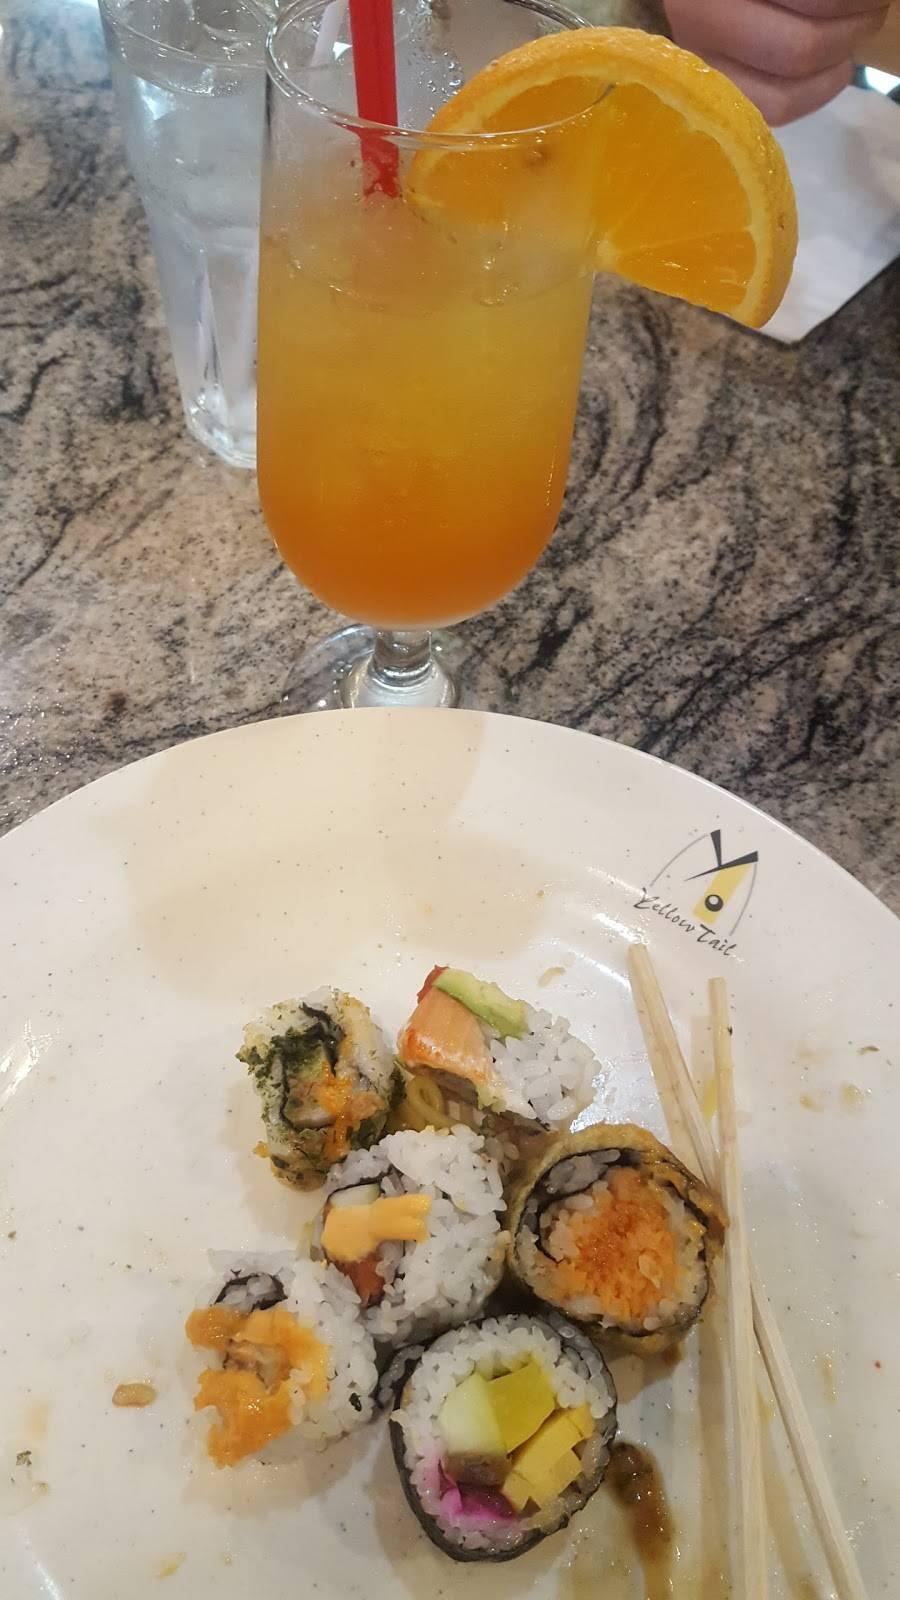 Kintaro All You Can Eat Sushi & Hotpot & BBQ | restaurant | 4054 Medina Rd, Akron, OH 44333, USA | 3306669988 OR +1 330-666-9988